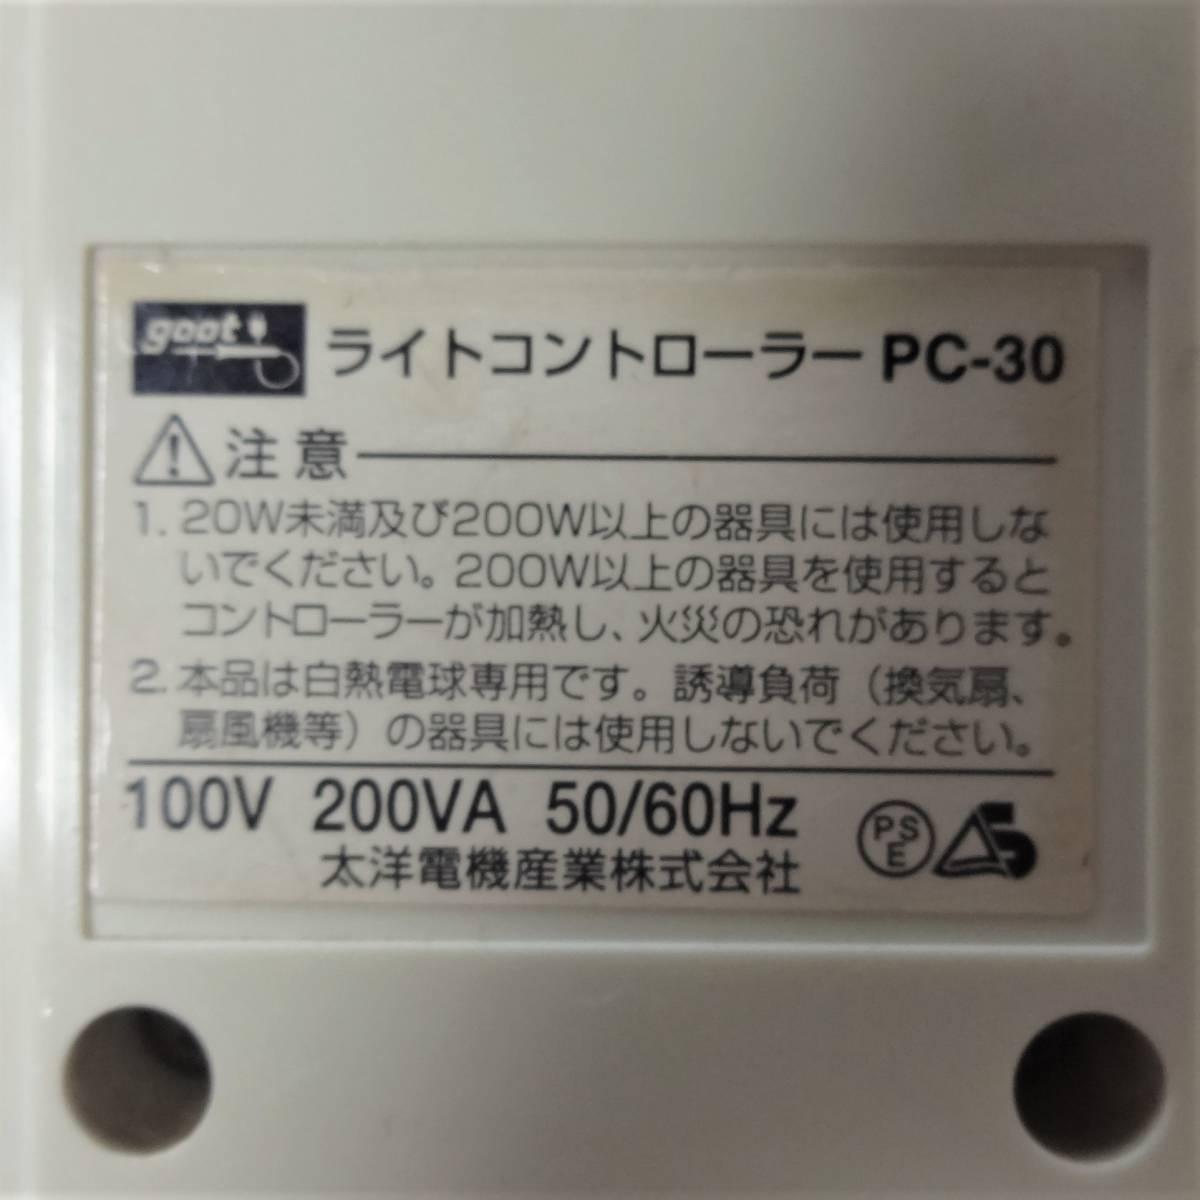 goot / 太洋電気産業 ライトコントローラー PC-30 廃番商品 半田ごてや白熱電球に対応_画像5